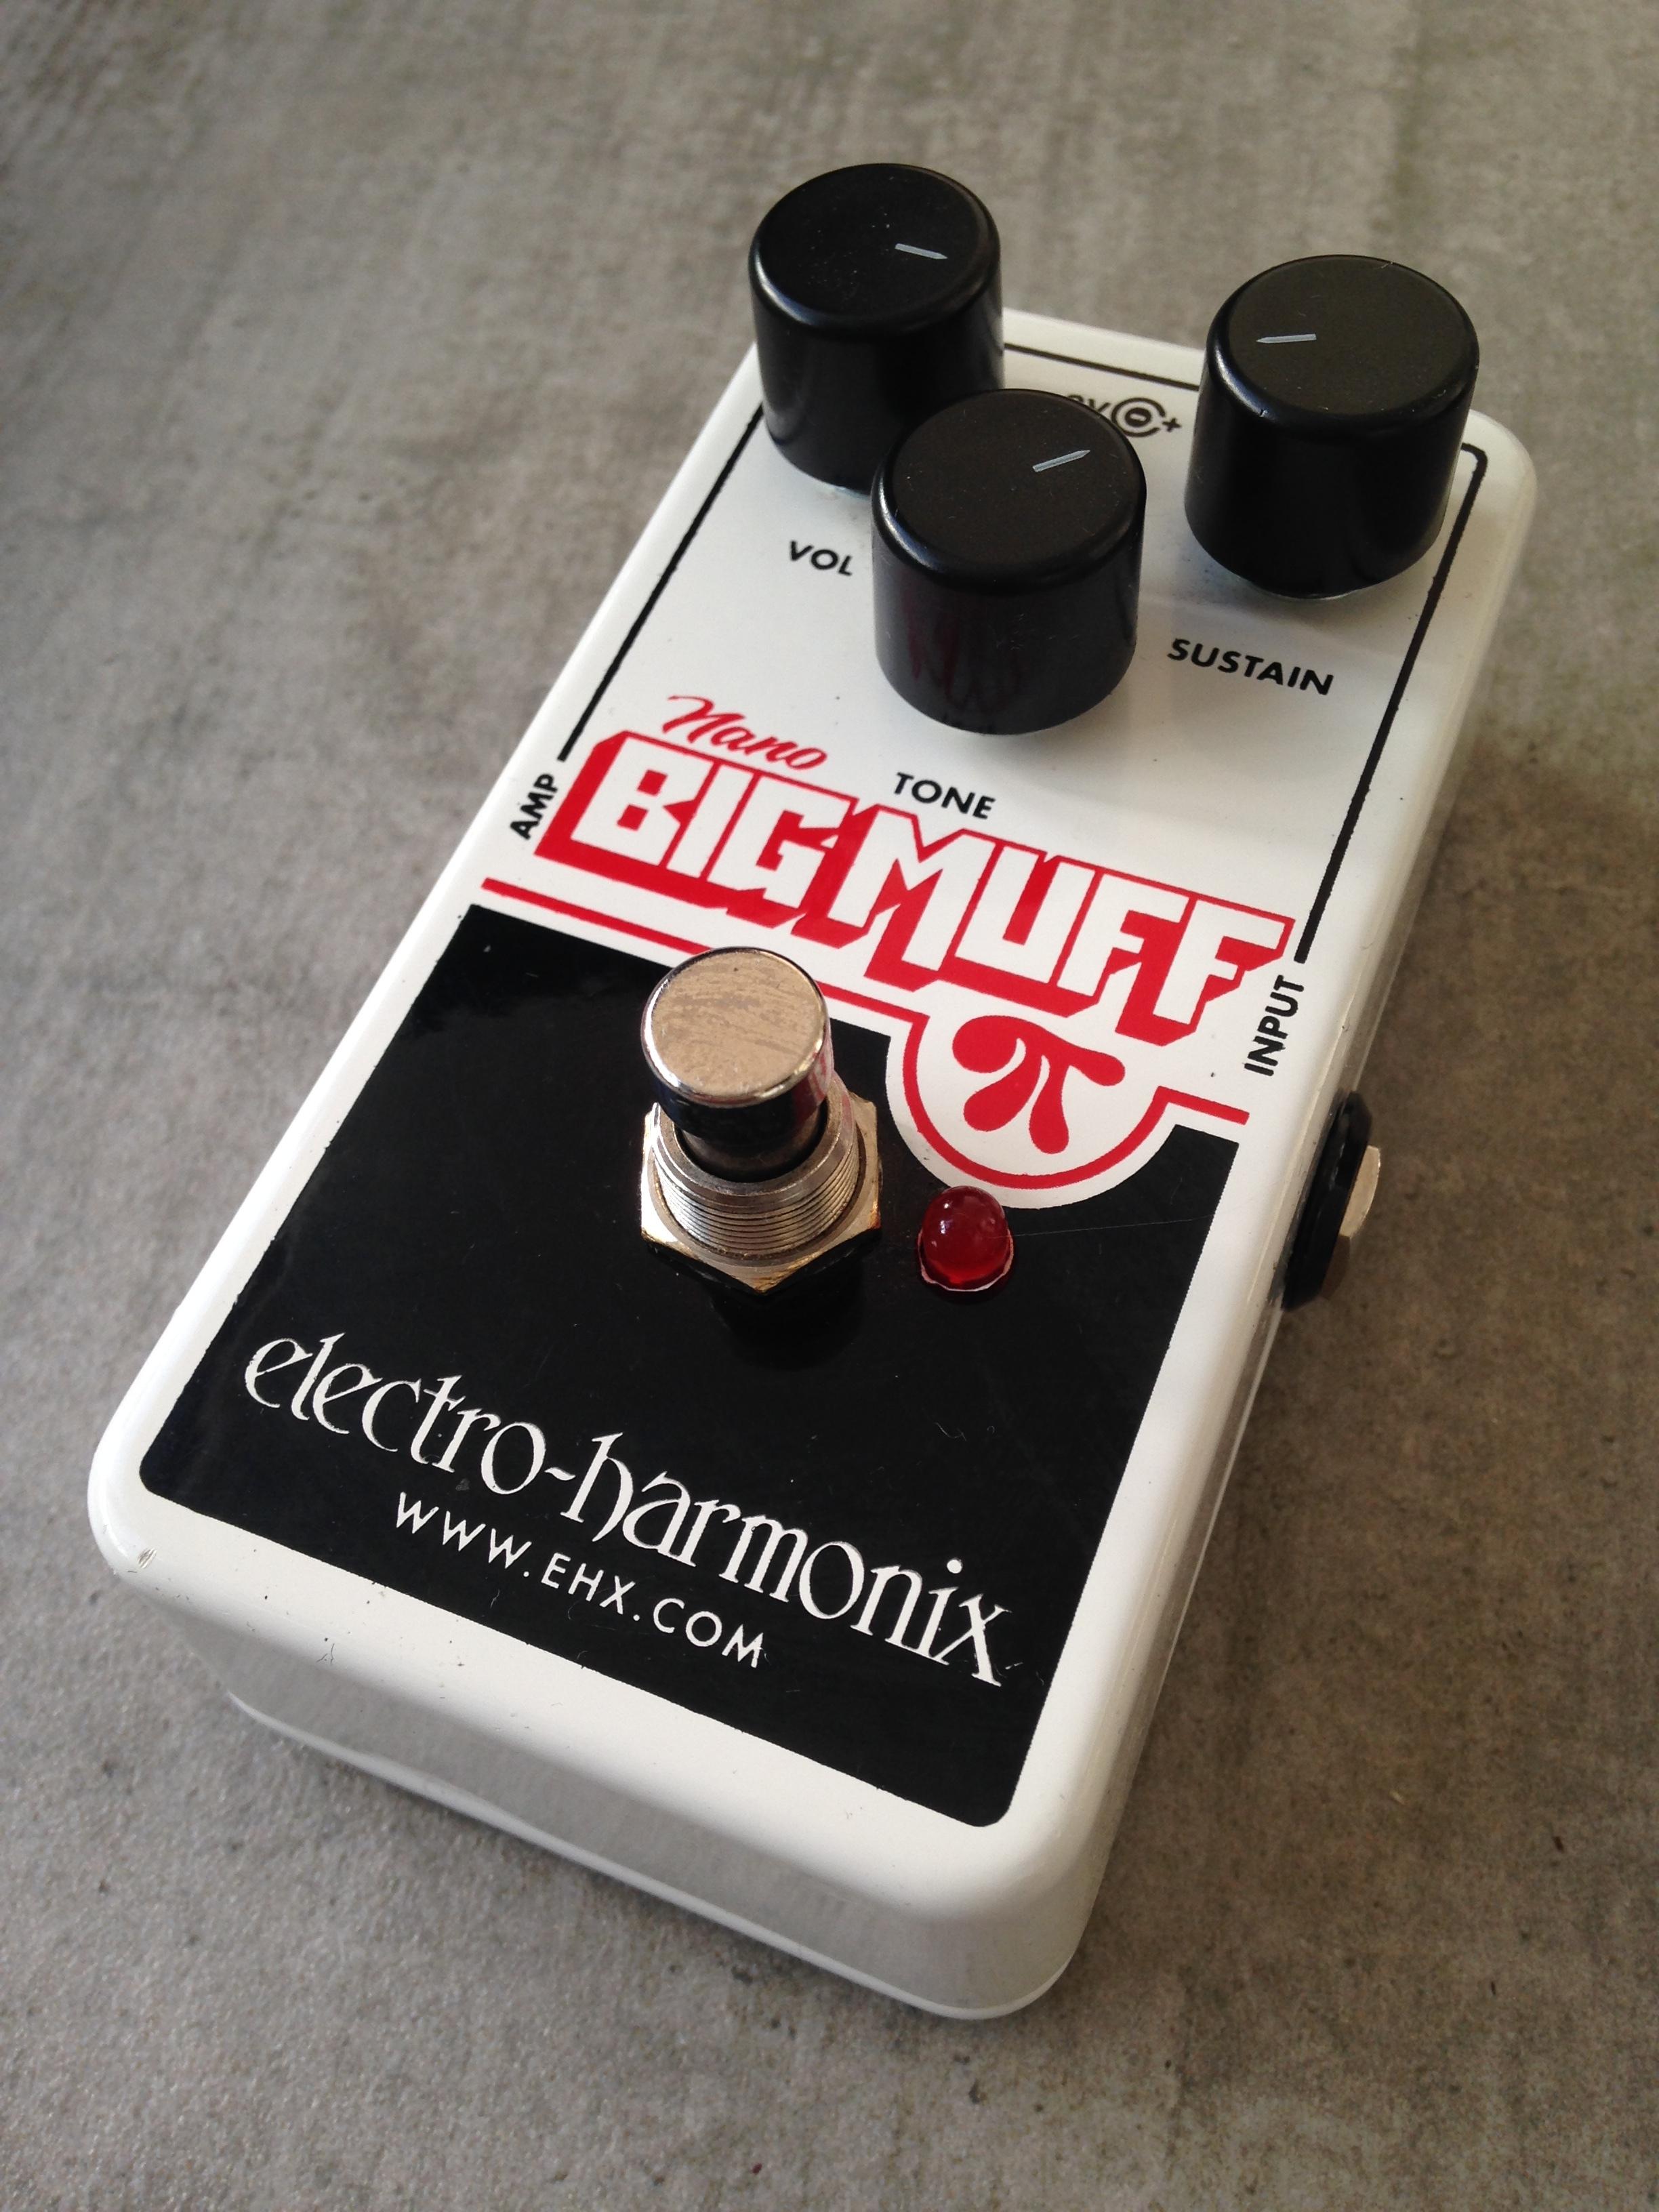 electro harmonix nano big muff pi image 1563580 audiofanzine. Black Bedroom Furniture Sets. Home Design Ideas